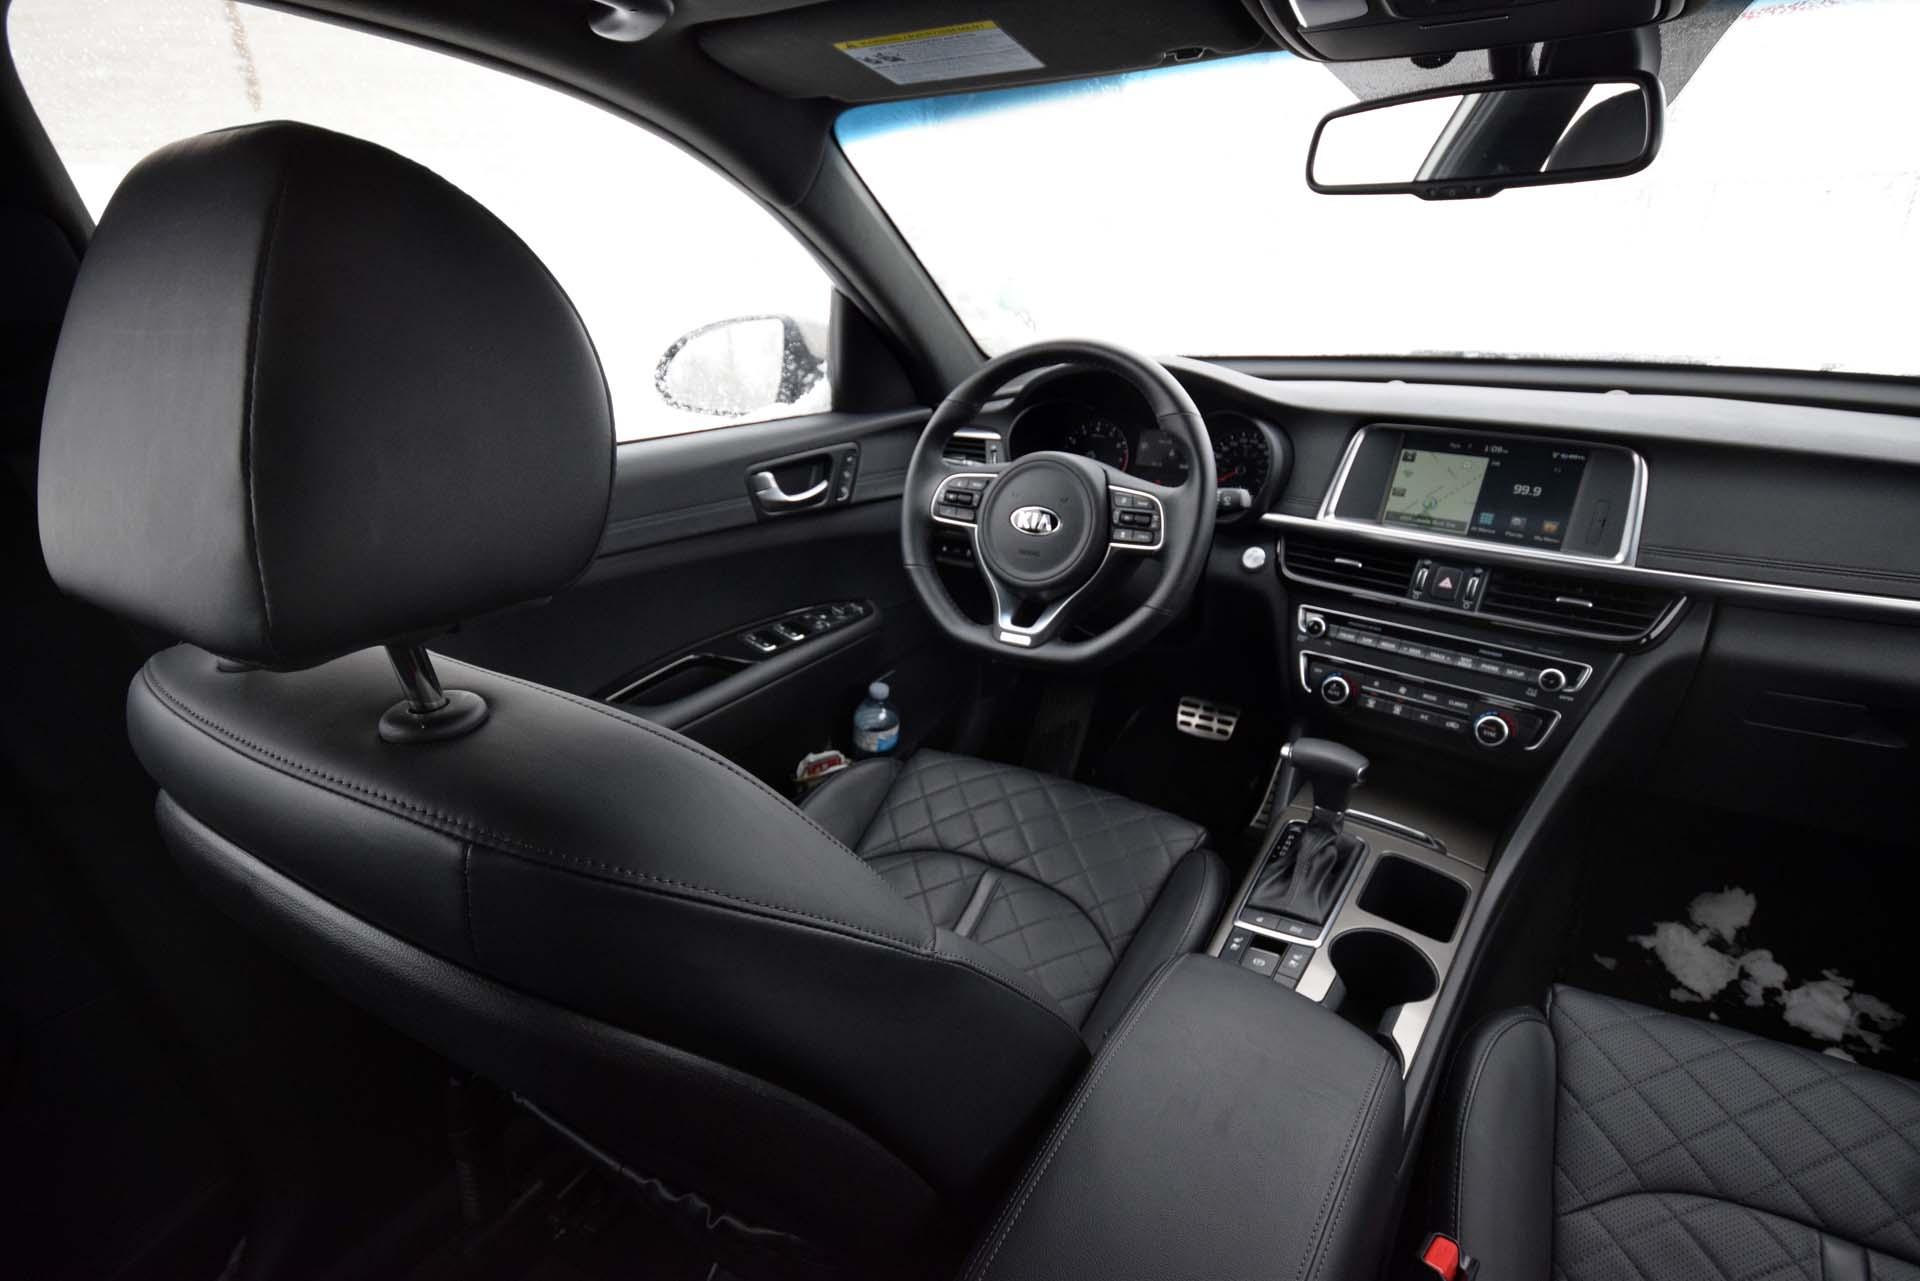 owned pre rock little used sedan in sxl optima kia inventory wheel drive front turbo